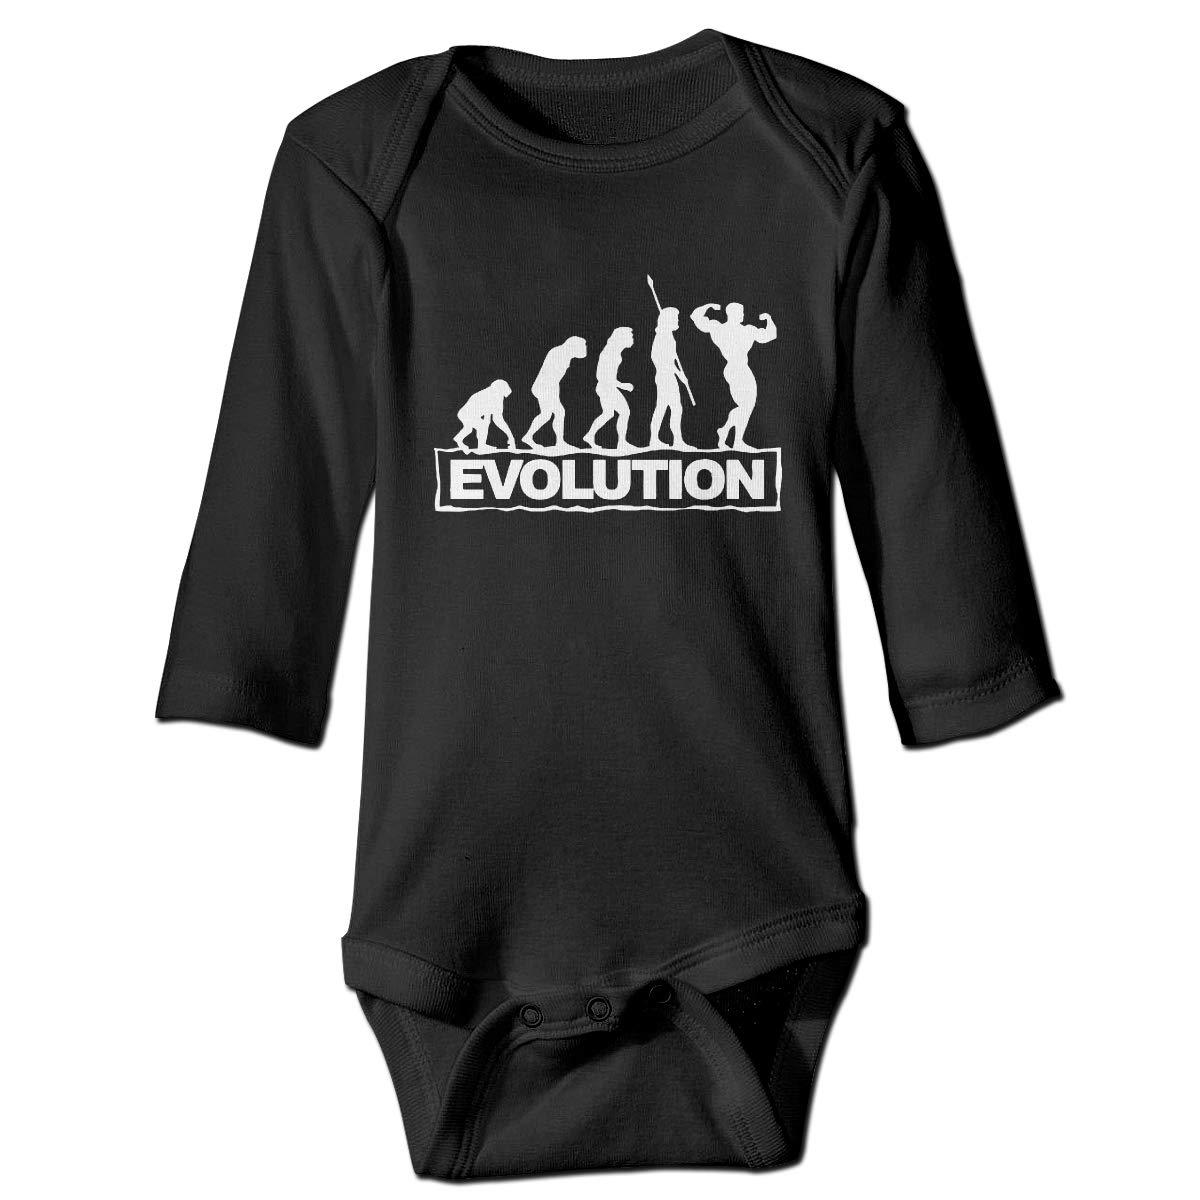 Evolution Bodybuilder Printed Baby Boys Long Sleeve Bodysuit Jumpsuit Outfits